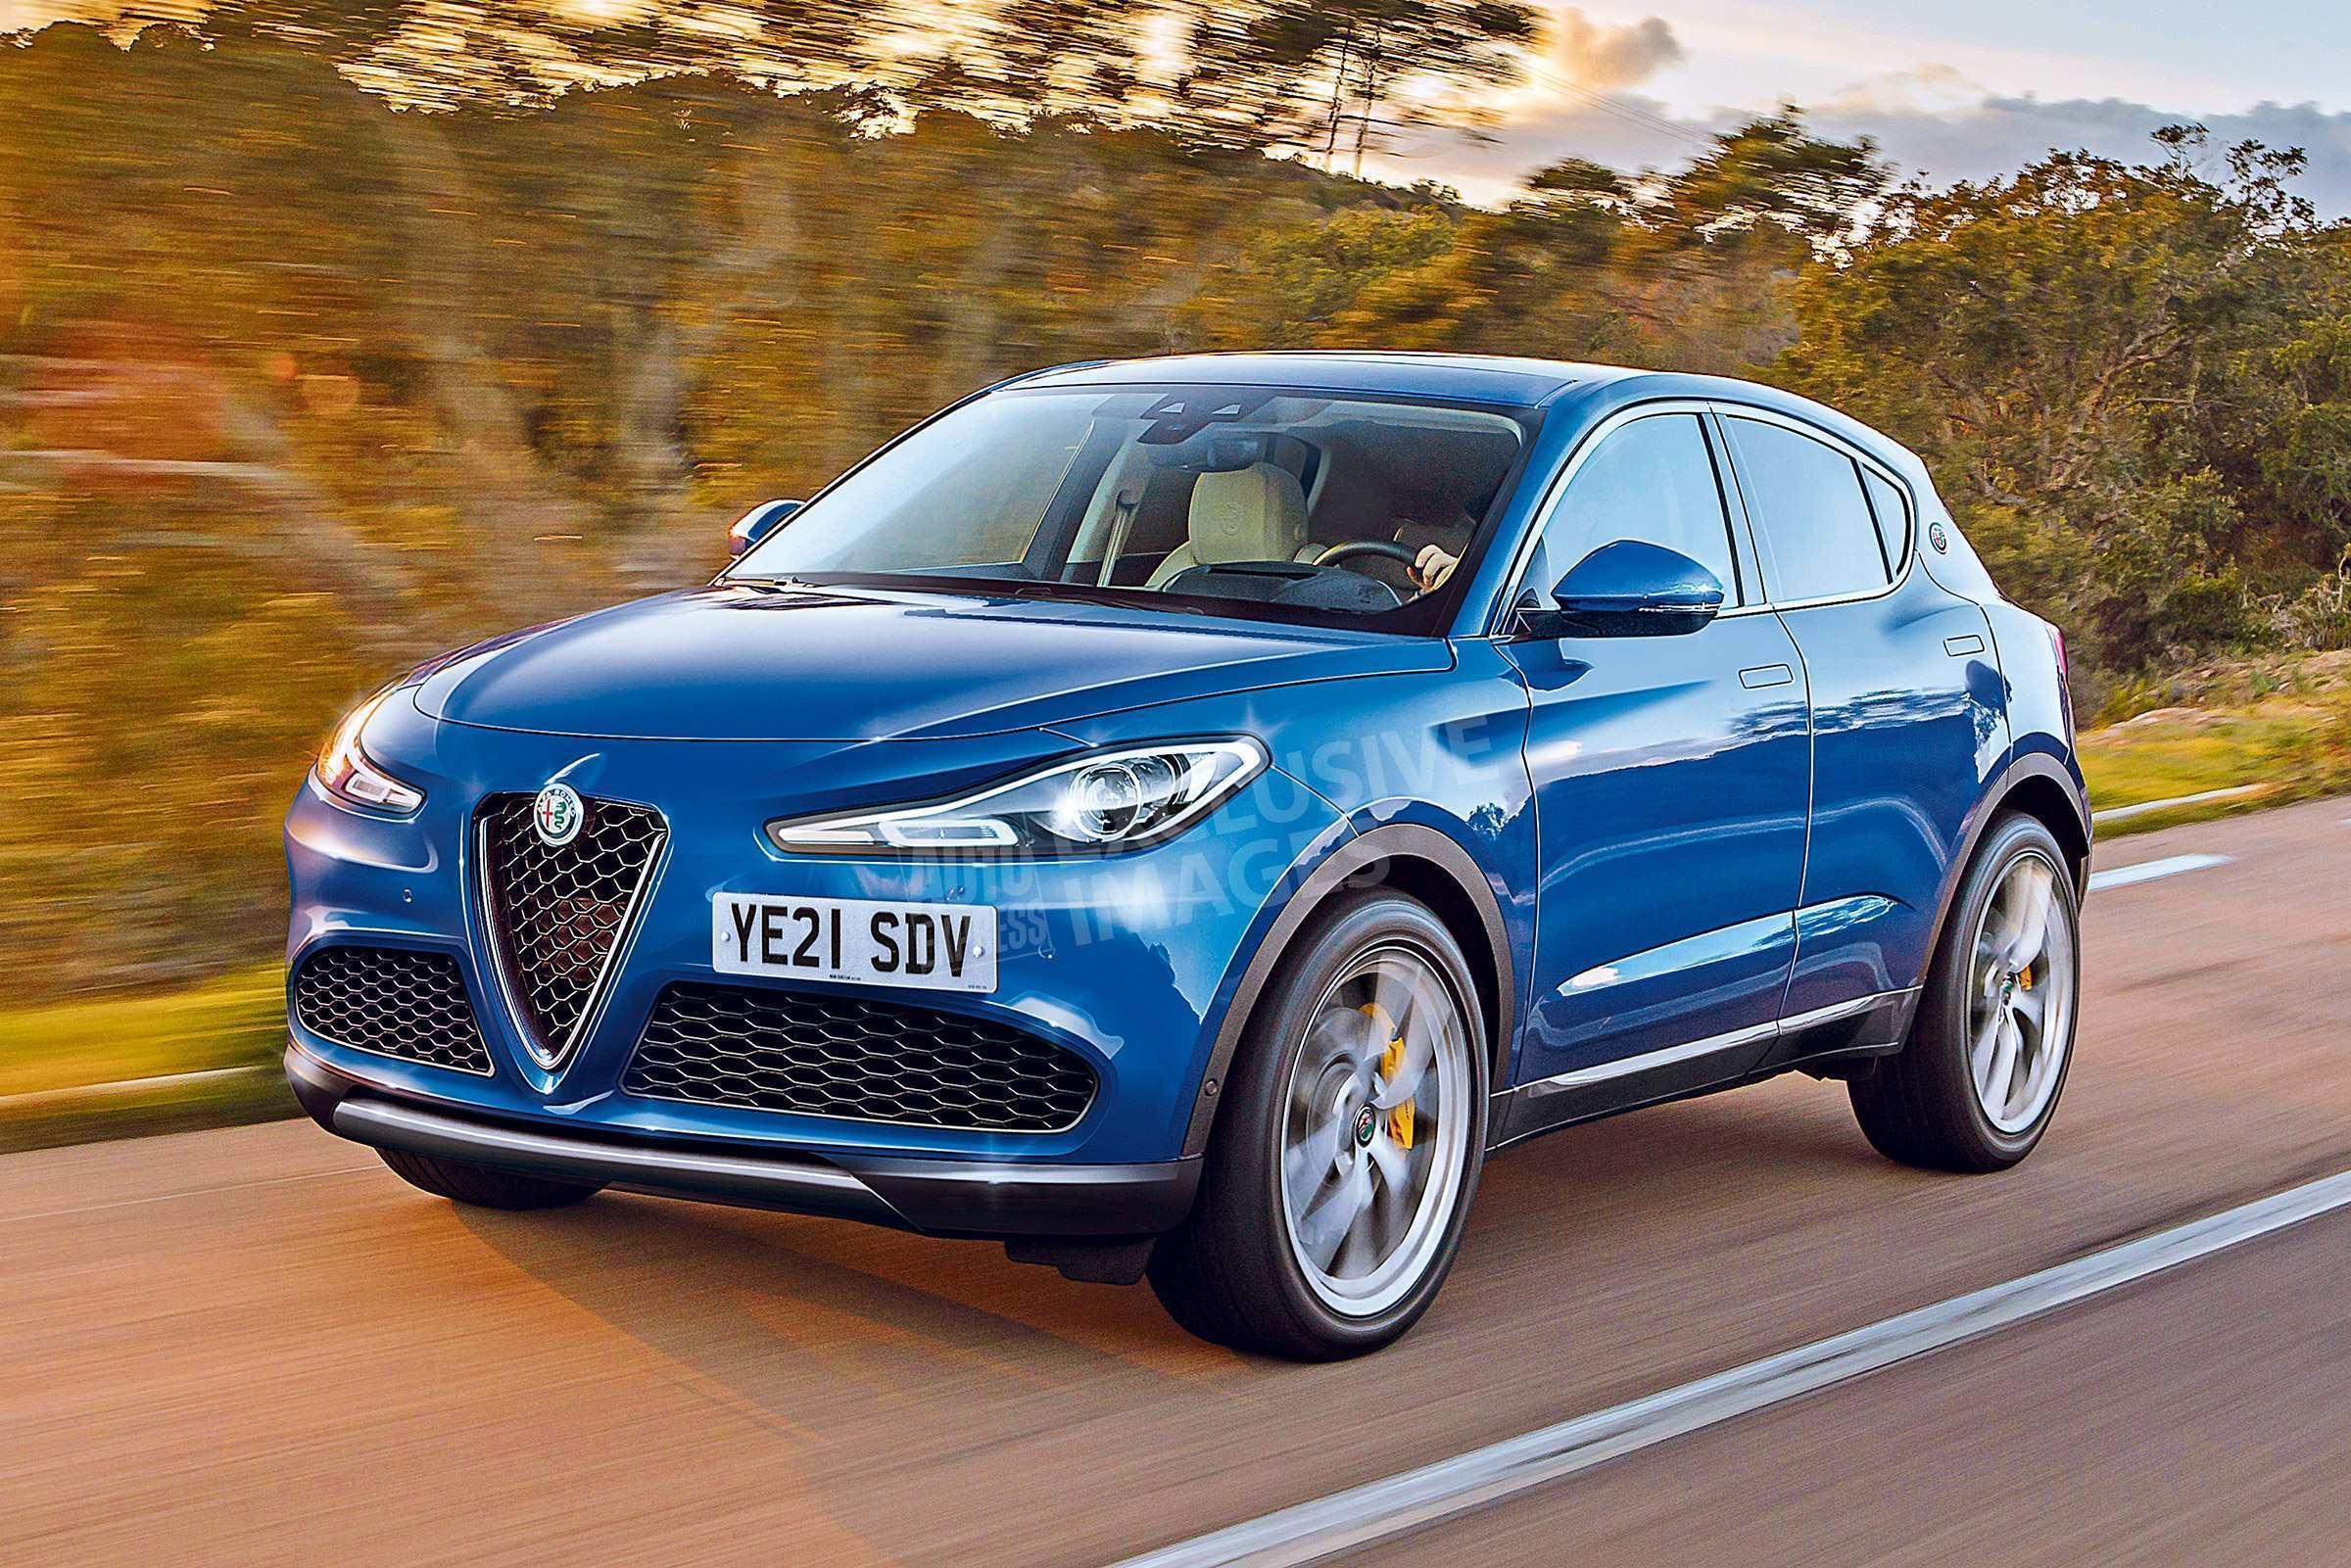 83 Best Review 2020 Alfa Romeo Suv Specs by 2020 Alfa Romeo Suv